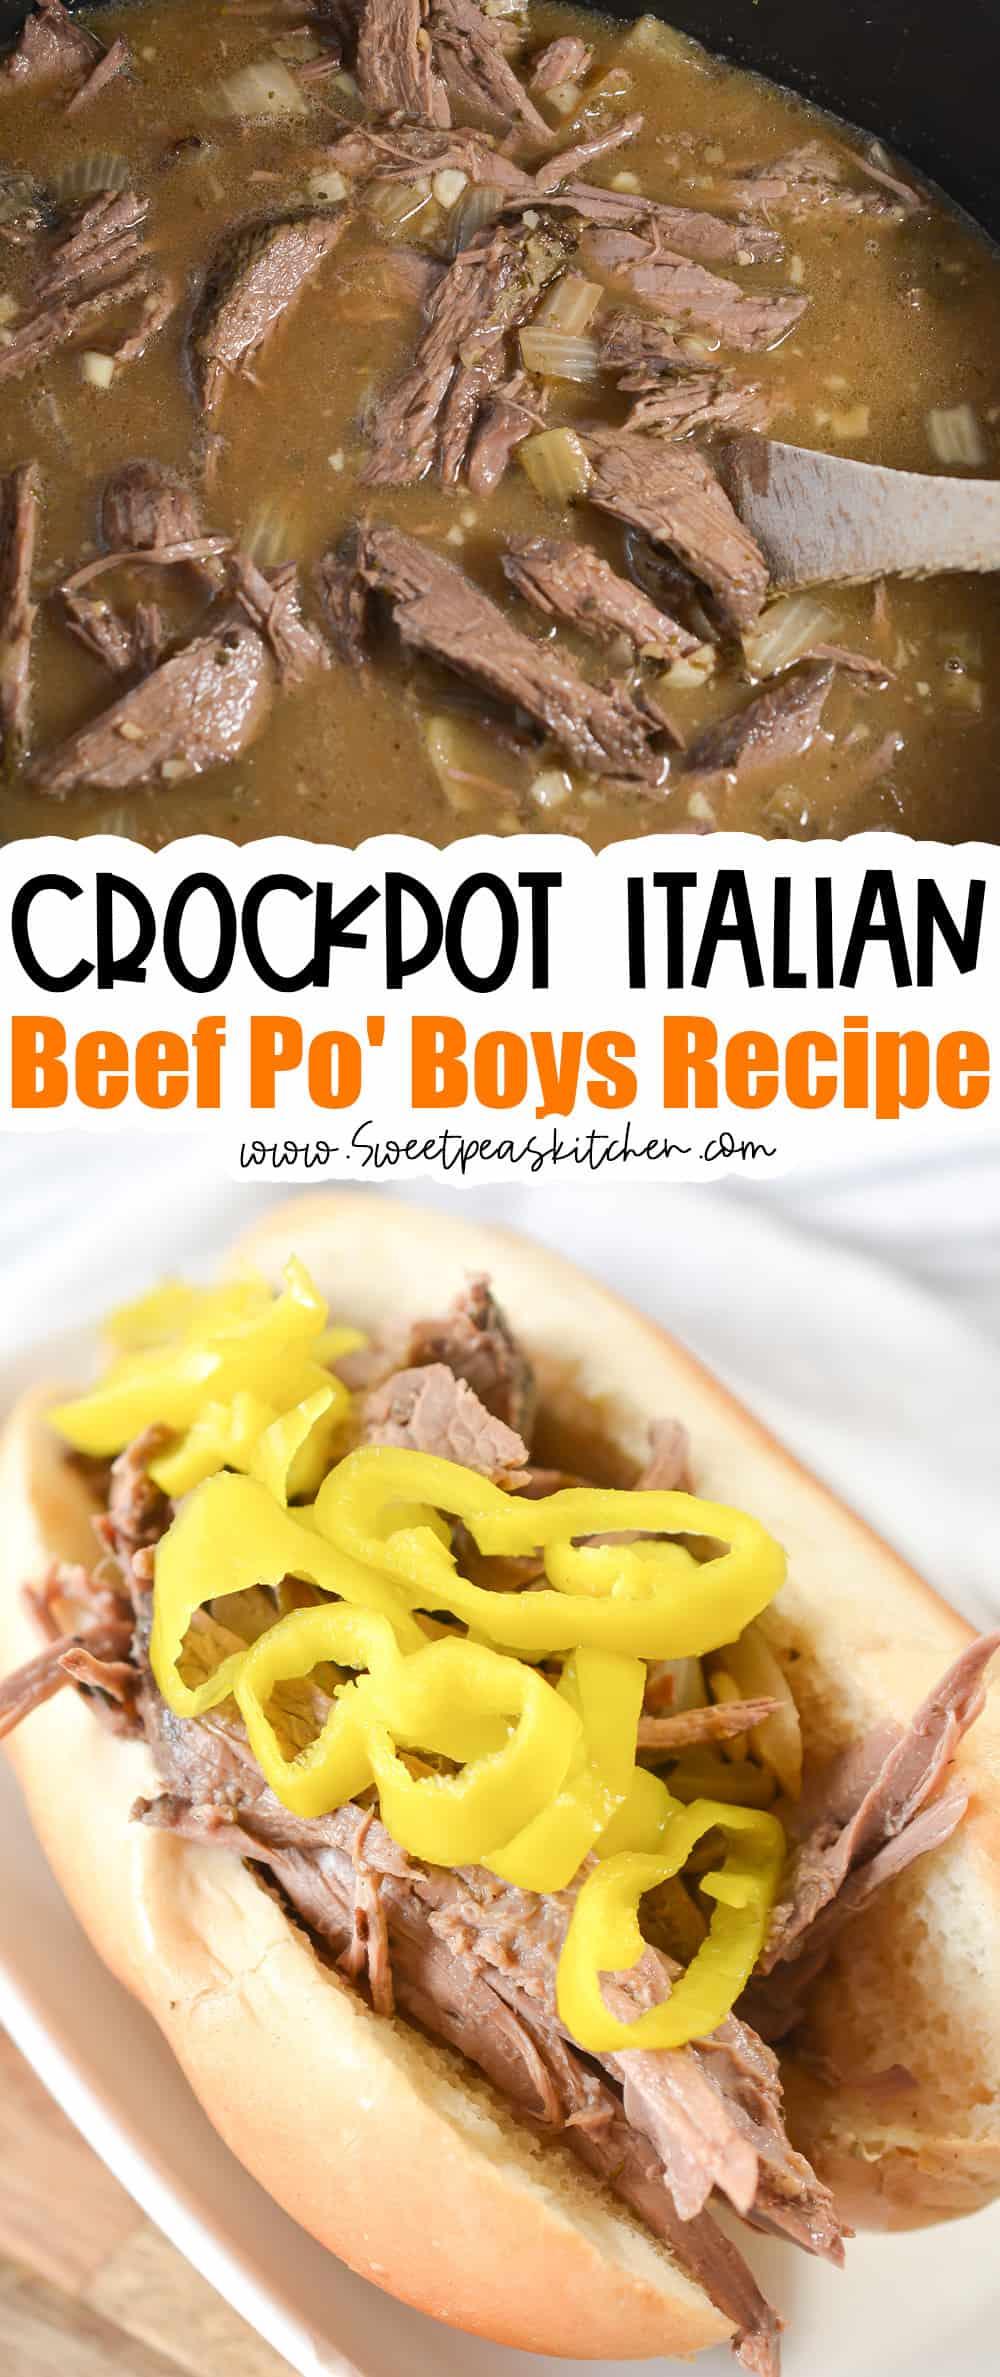 Crockpot Italian Beef Po' Boys